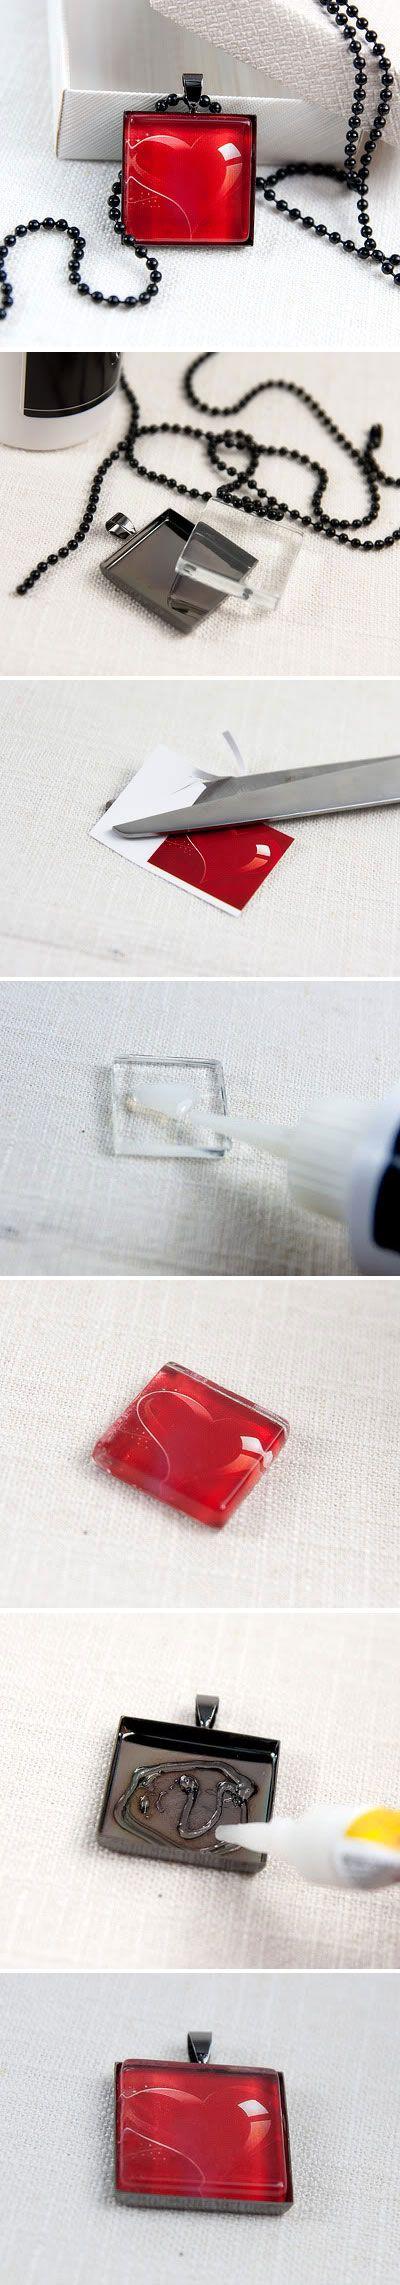 DIY tutorial how to make a glass tile pendant.  http://irinascutebox.blogspot.com/2011/03/how-to-make-glass-tile-pendant.html